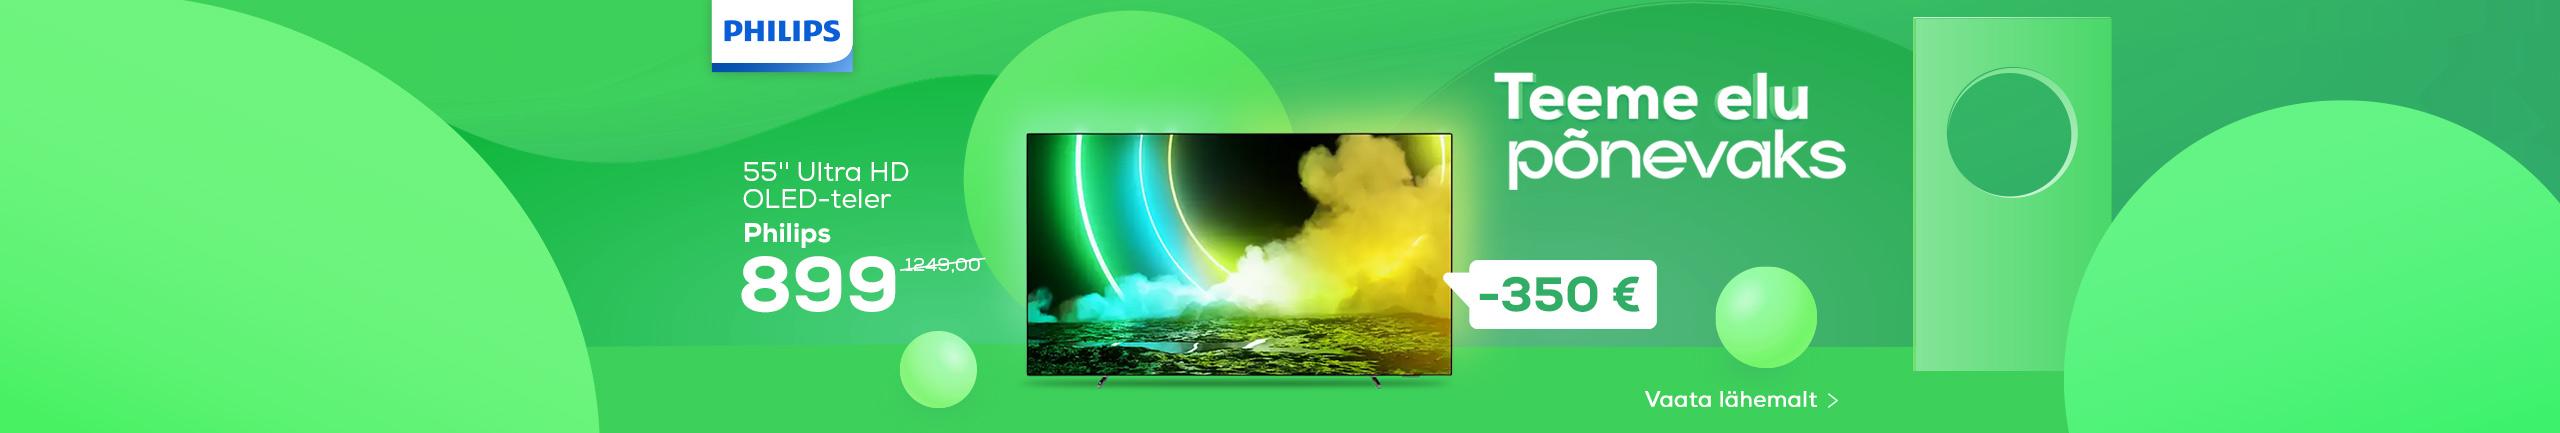 FPS We make life easy! Philips TV